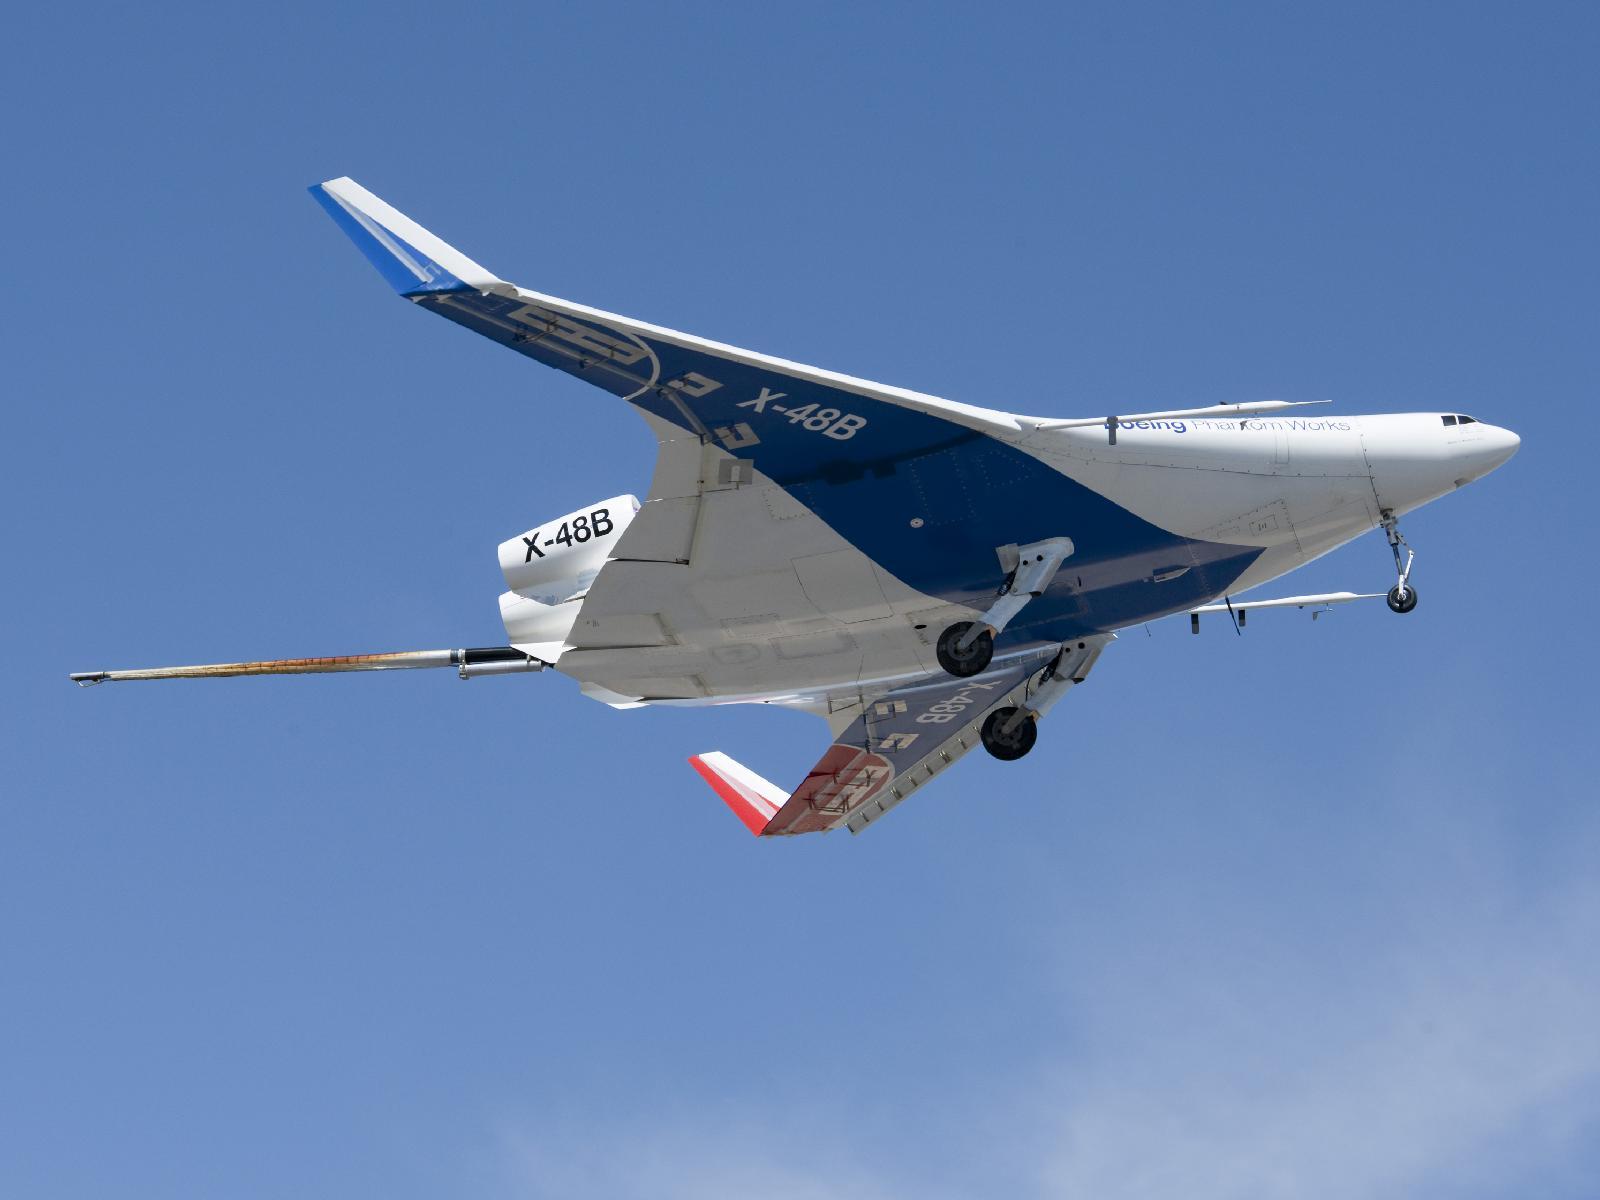 X-48B in Flight